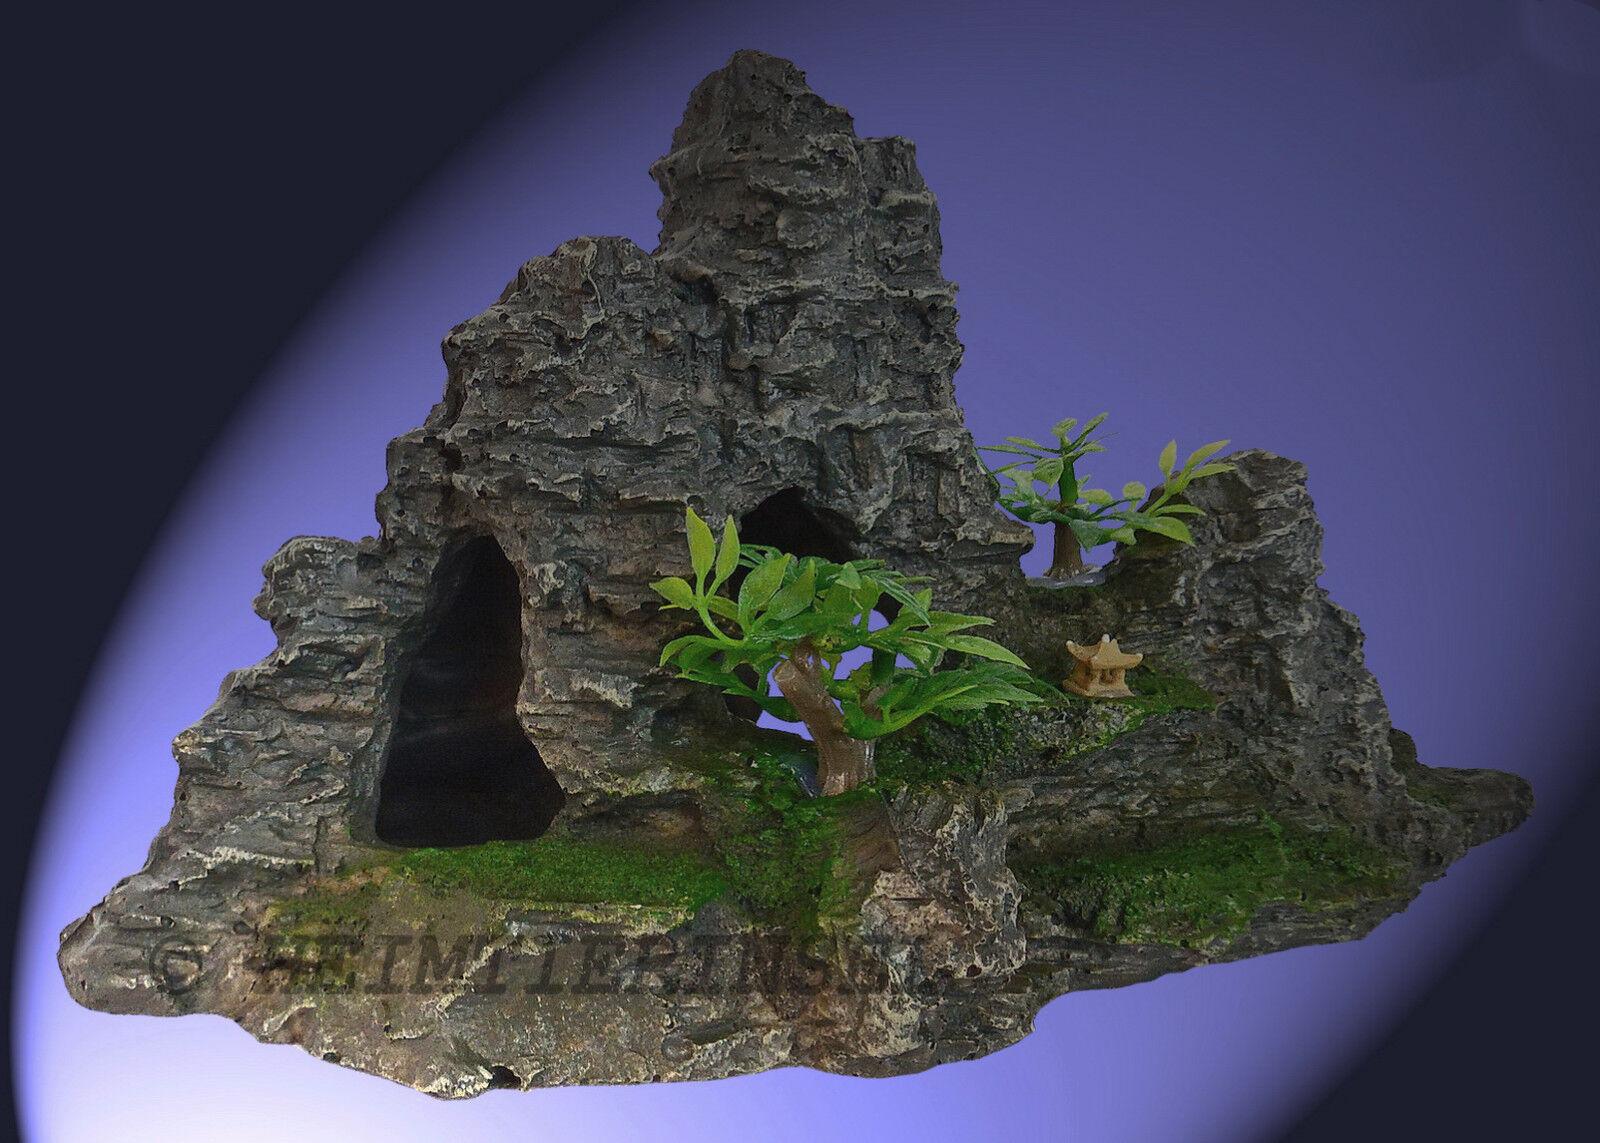 aquarium deko grotten h hle stein welse barsche terrarium dekoration zubeh r eur 8 99. Black Bedroom Furniture Sets. Home Design Ideas